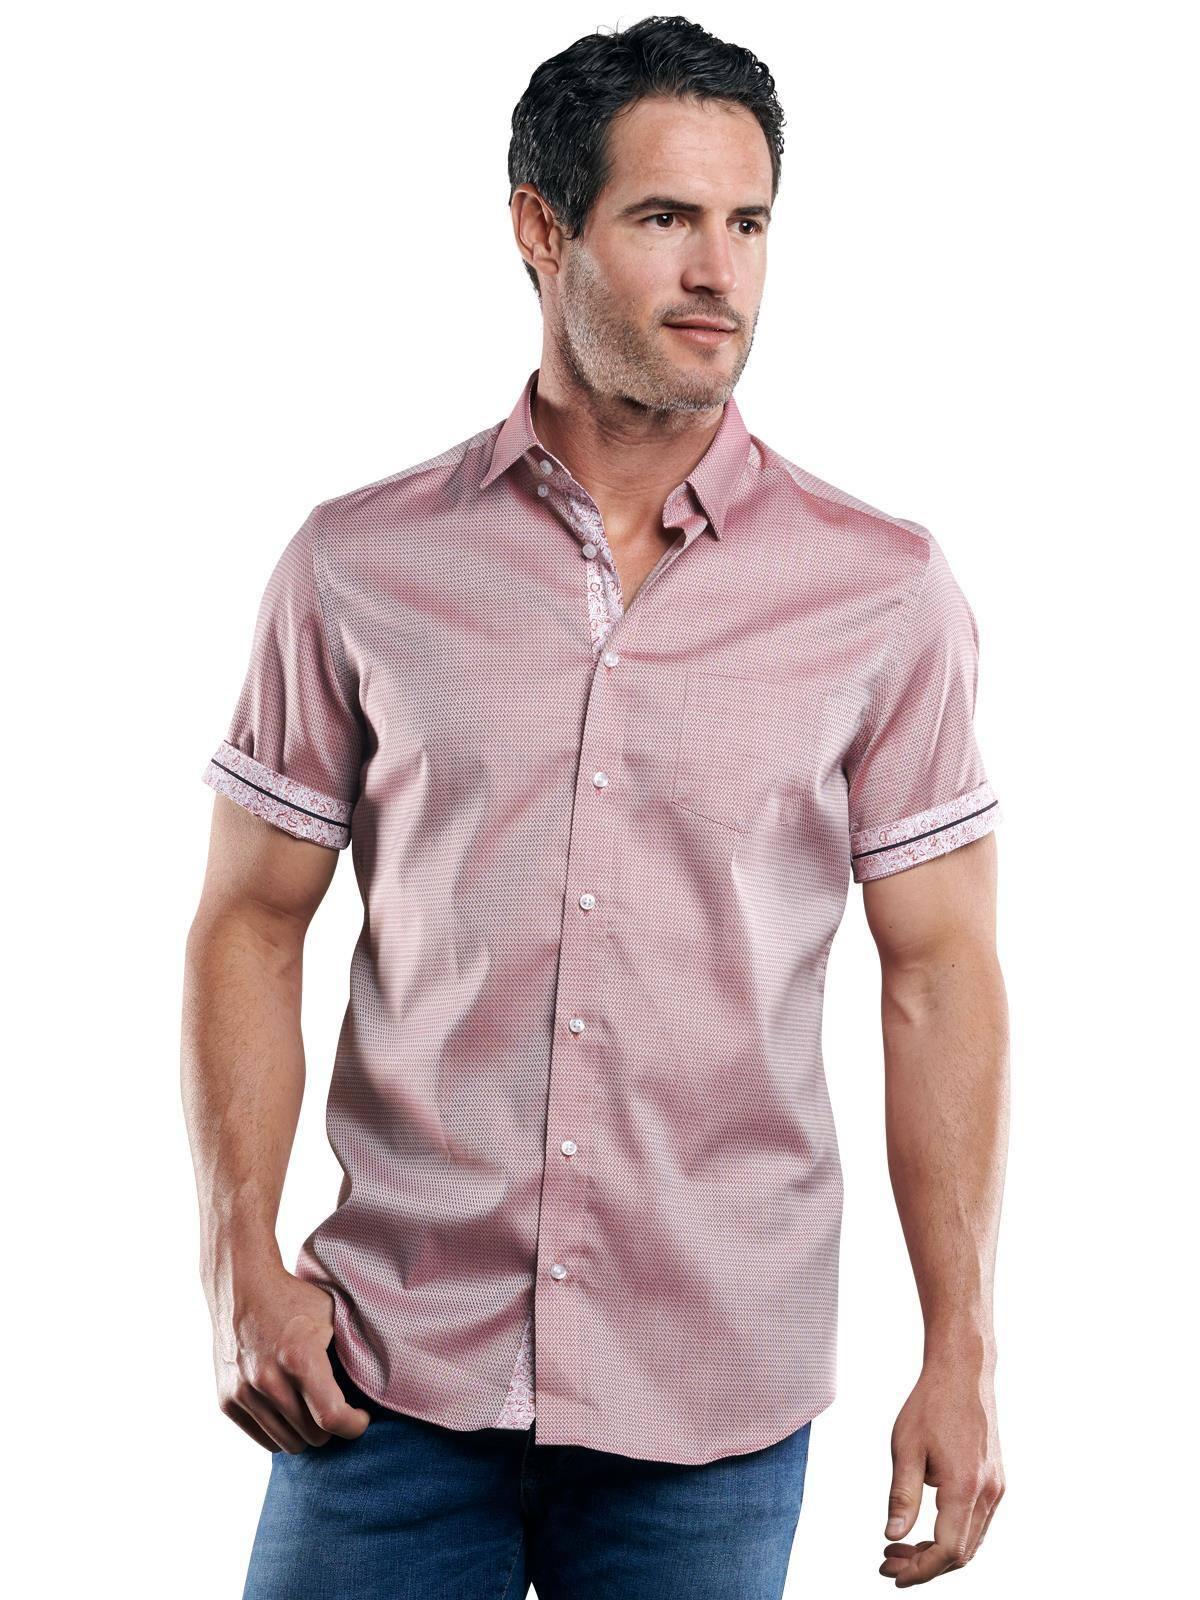 Engbers 100% bügelfreies Hemd, rot, Herren